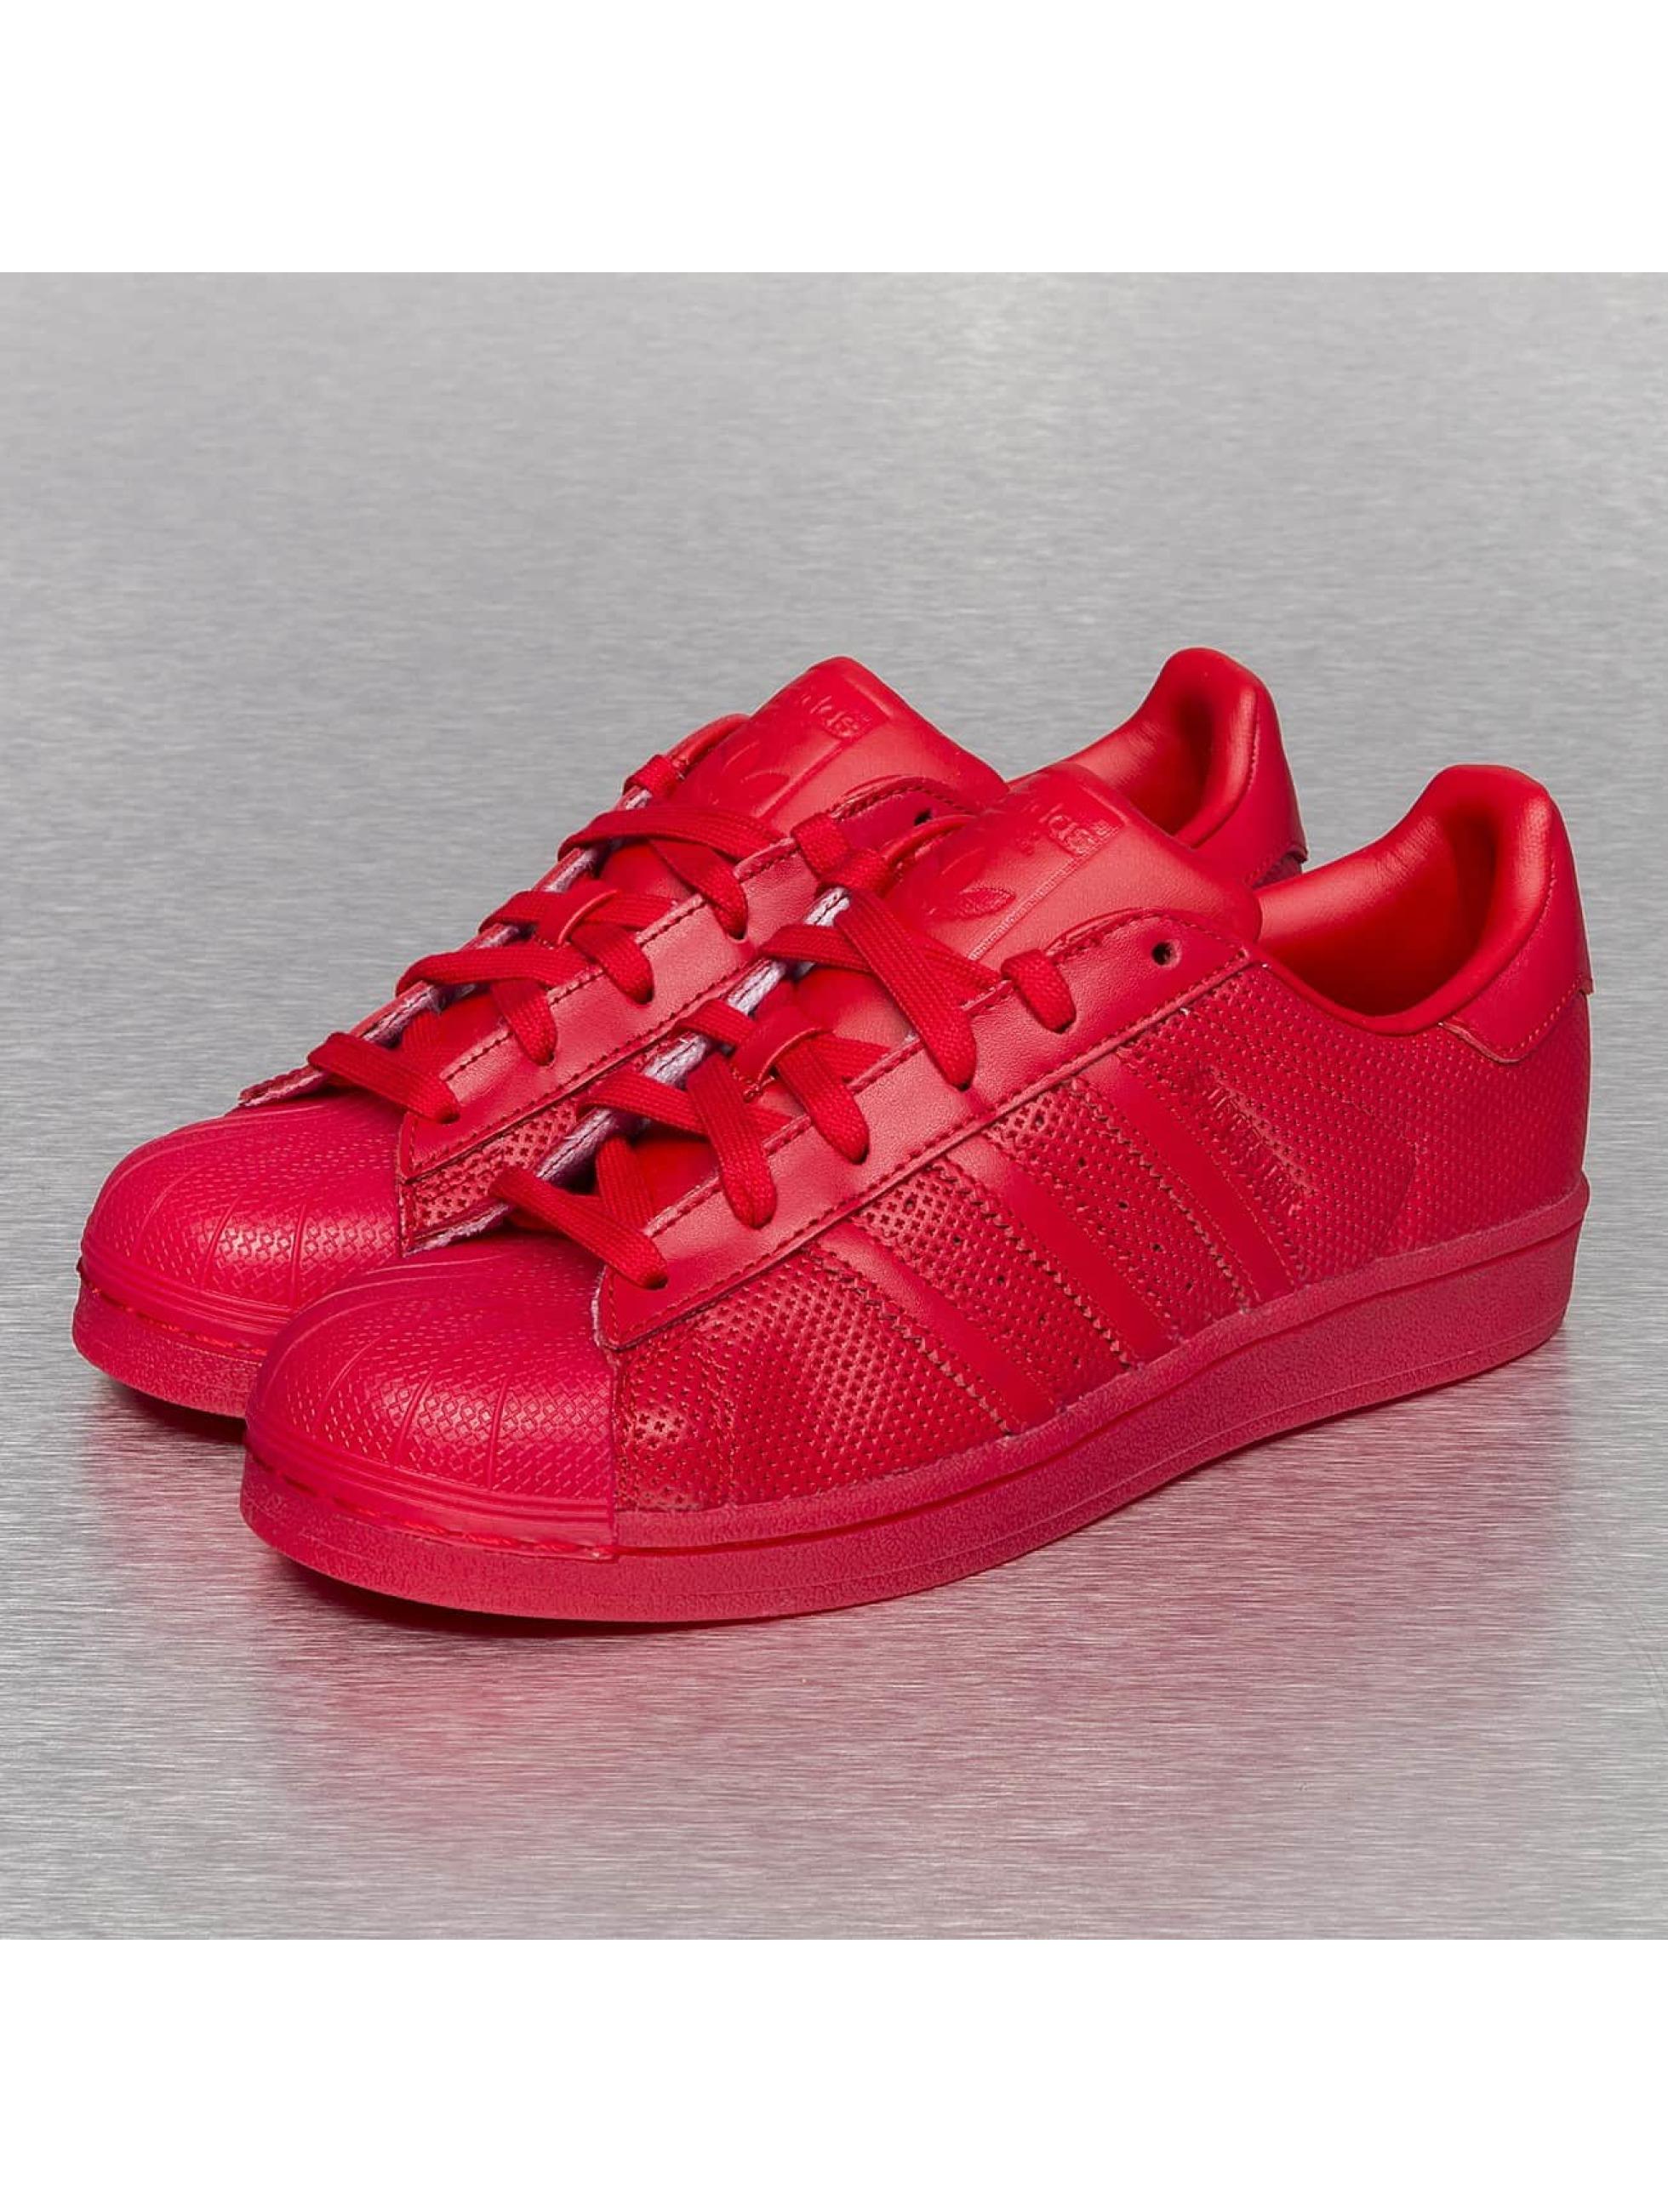 Adidas Sportschoenen Rood